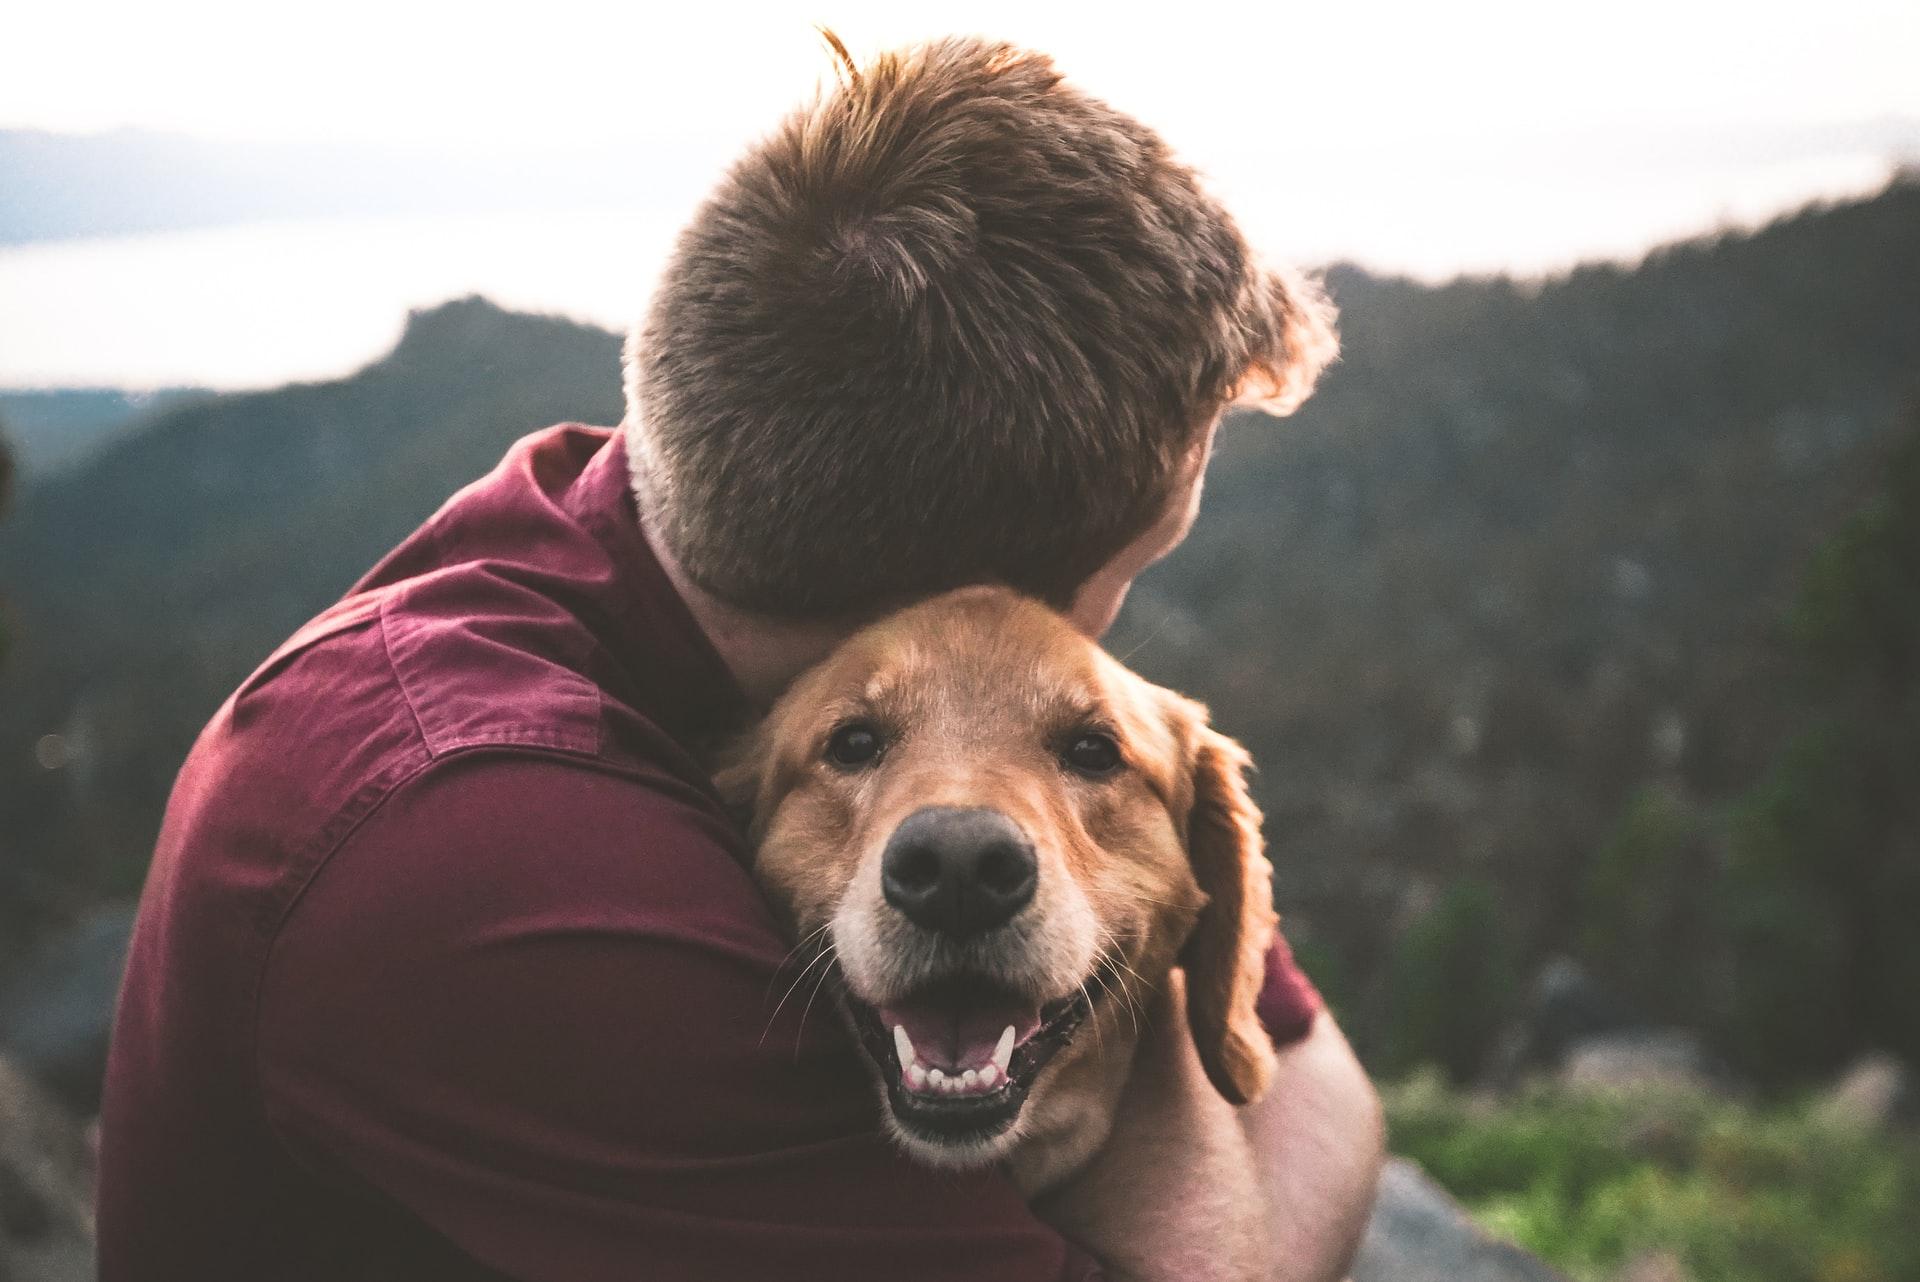 CBD as an alternative treatment for pets